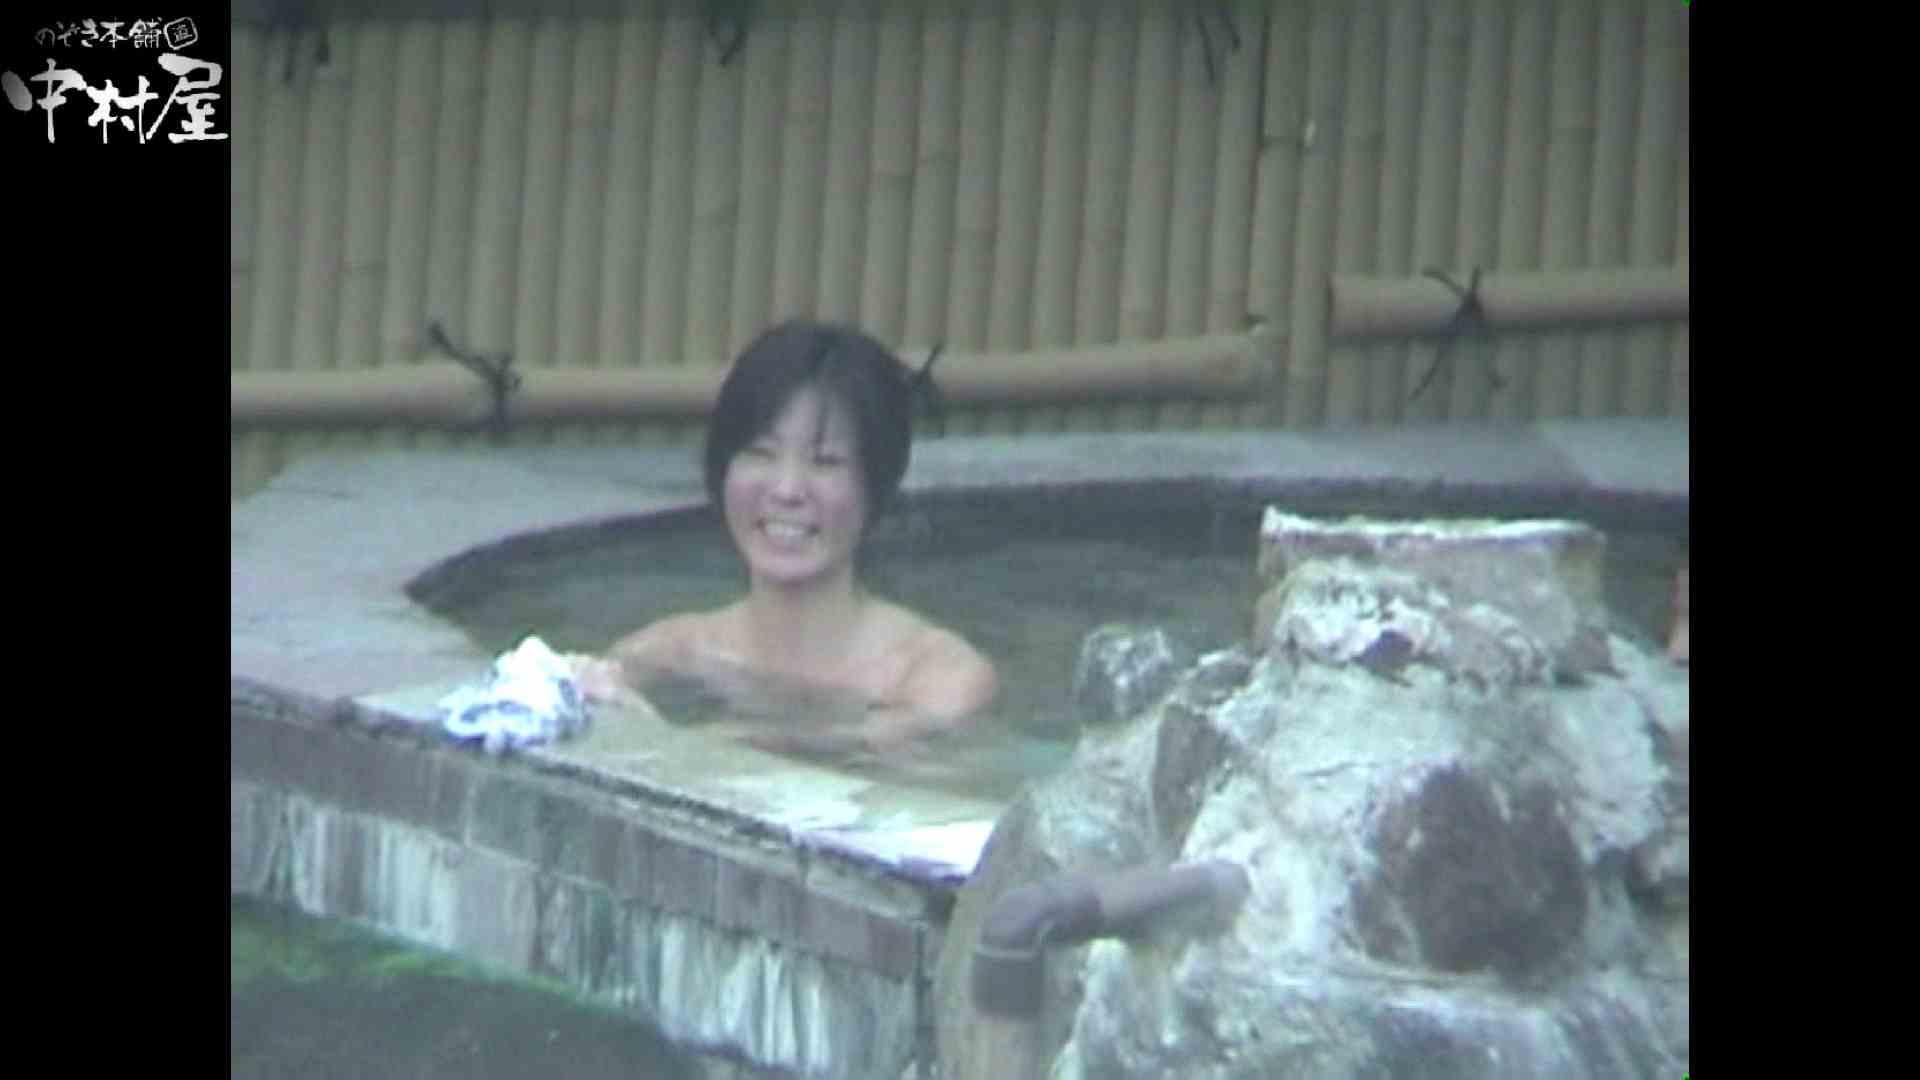 Aquaな露天風呂Vol.972 盗撮 おまんこ動画流出 80画像 2